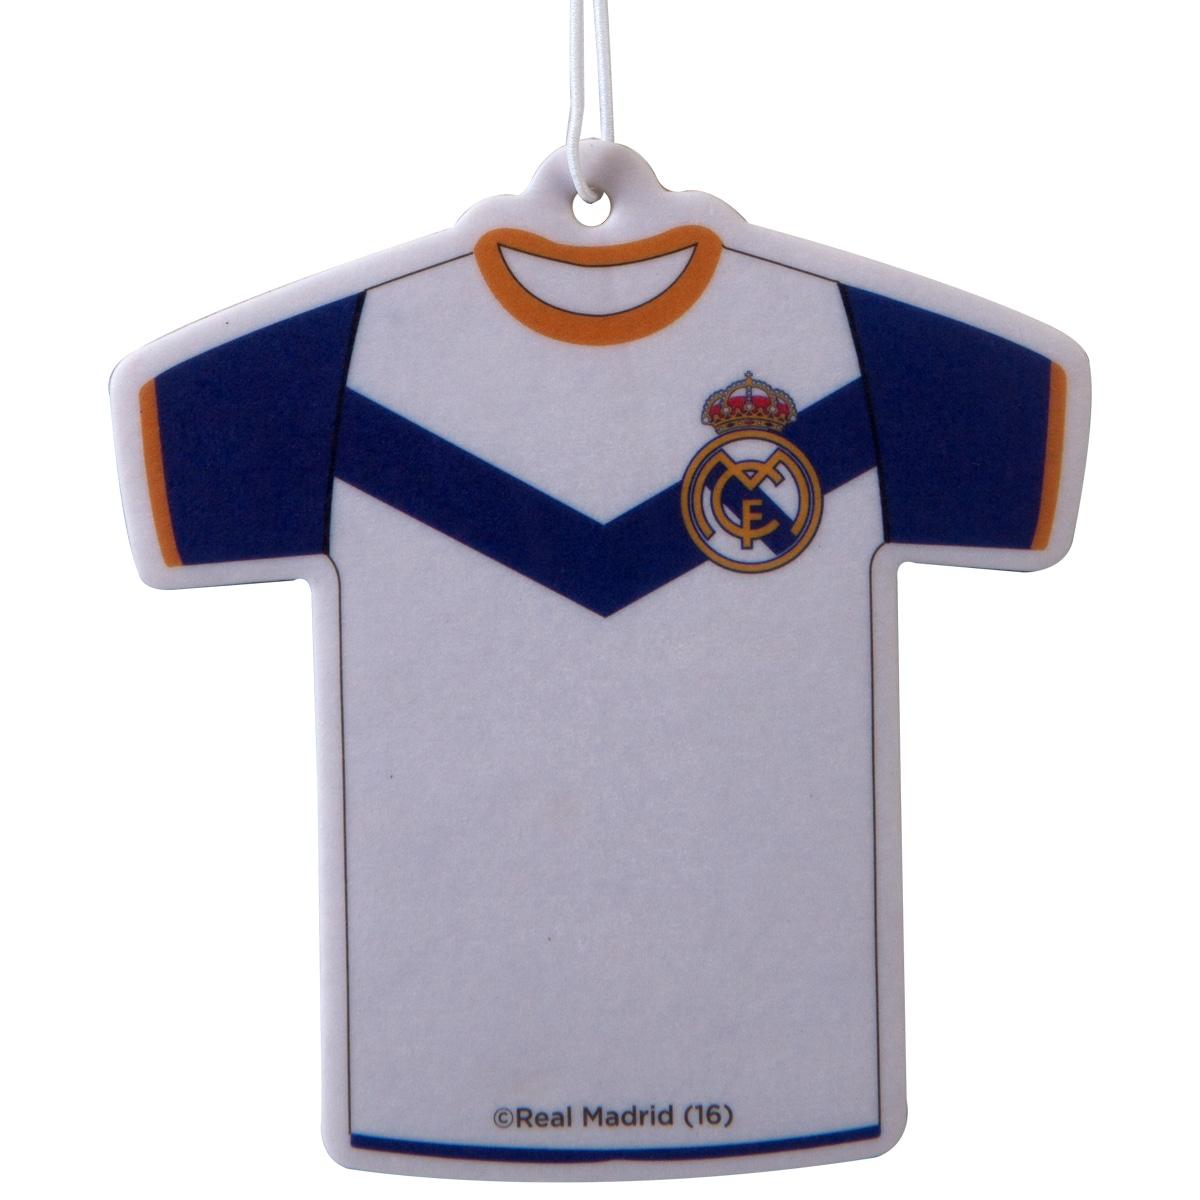 Real Madrid C.F. Jersey Air Freshener - 1